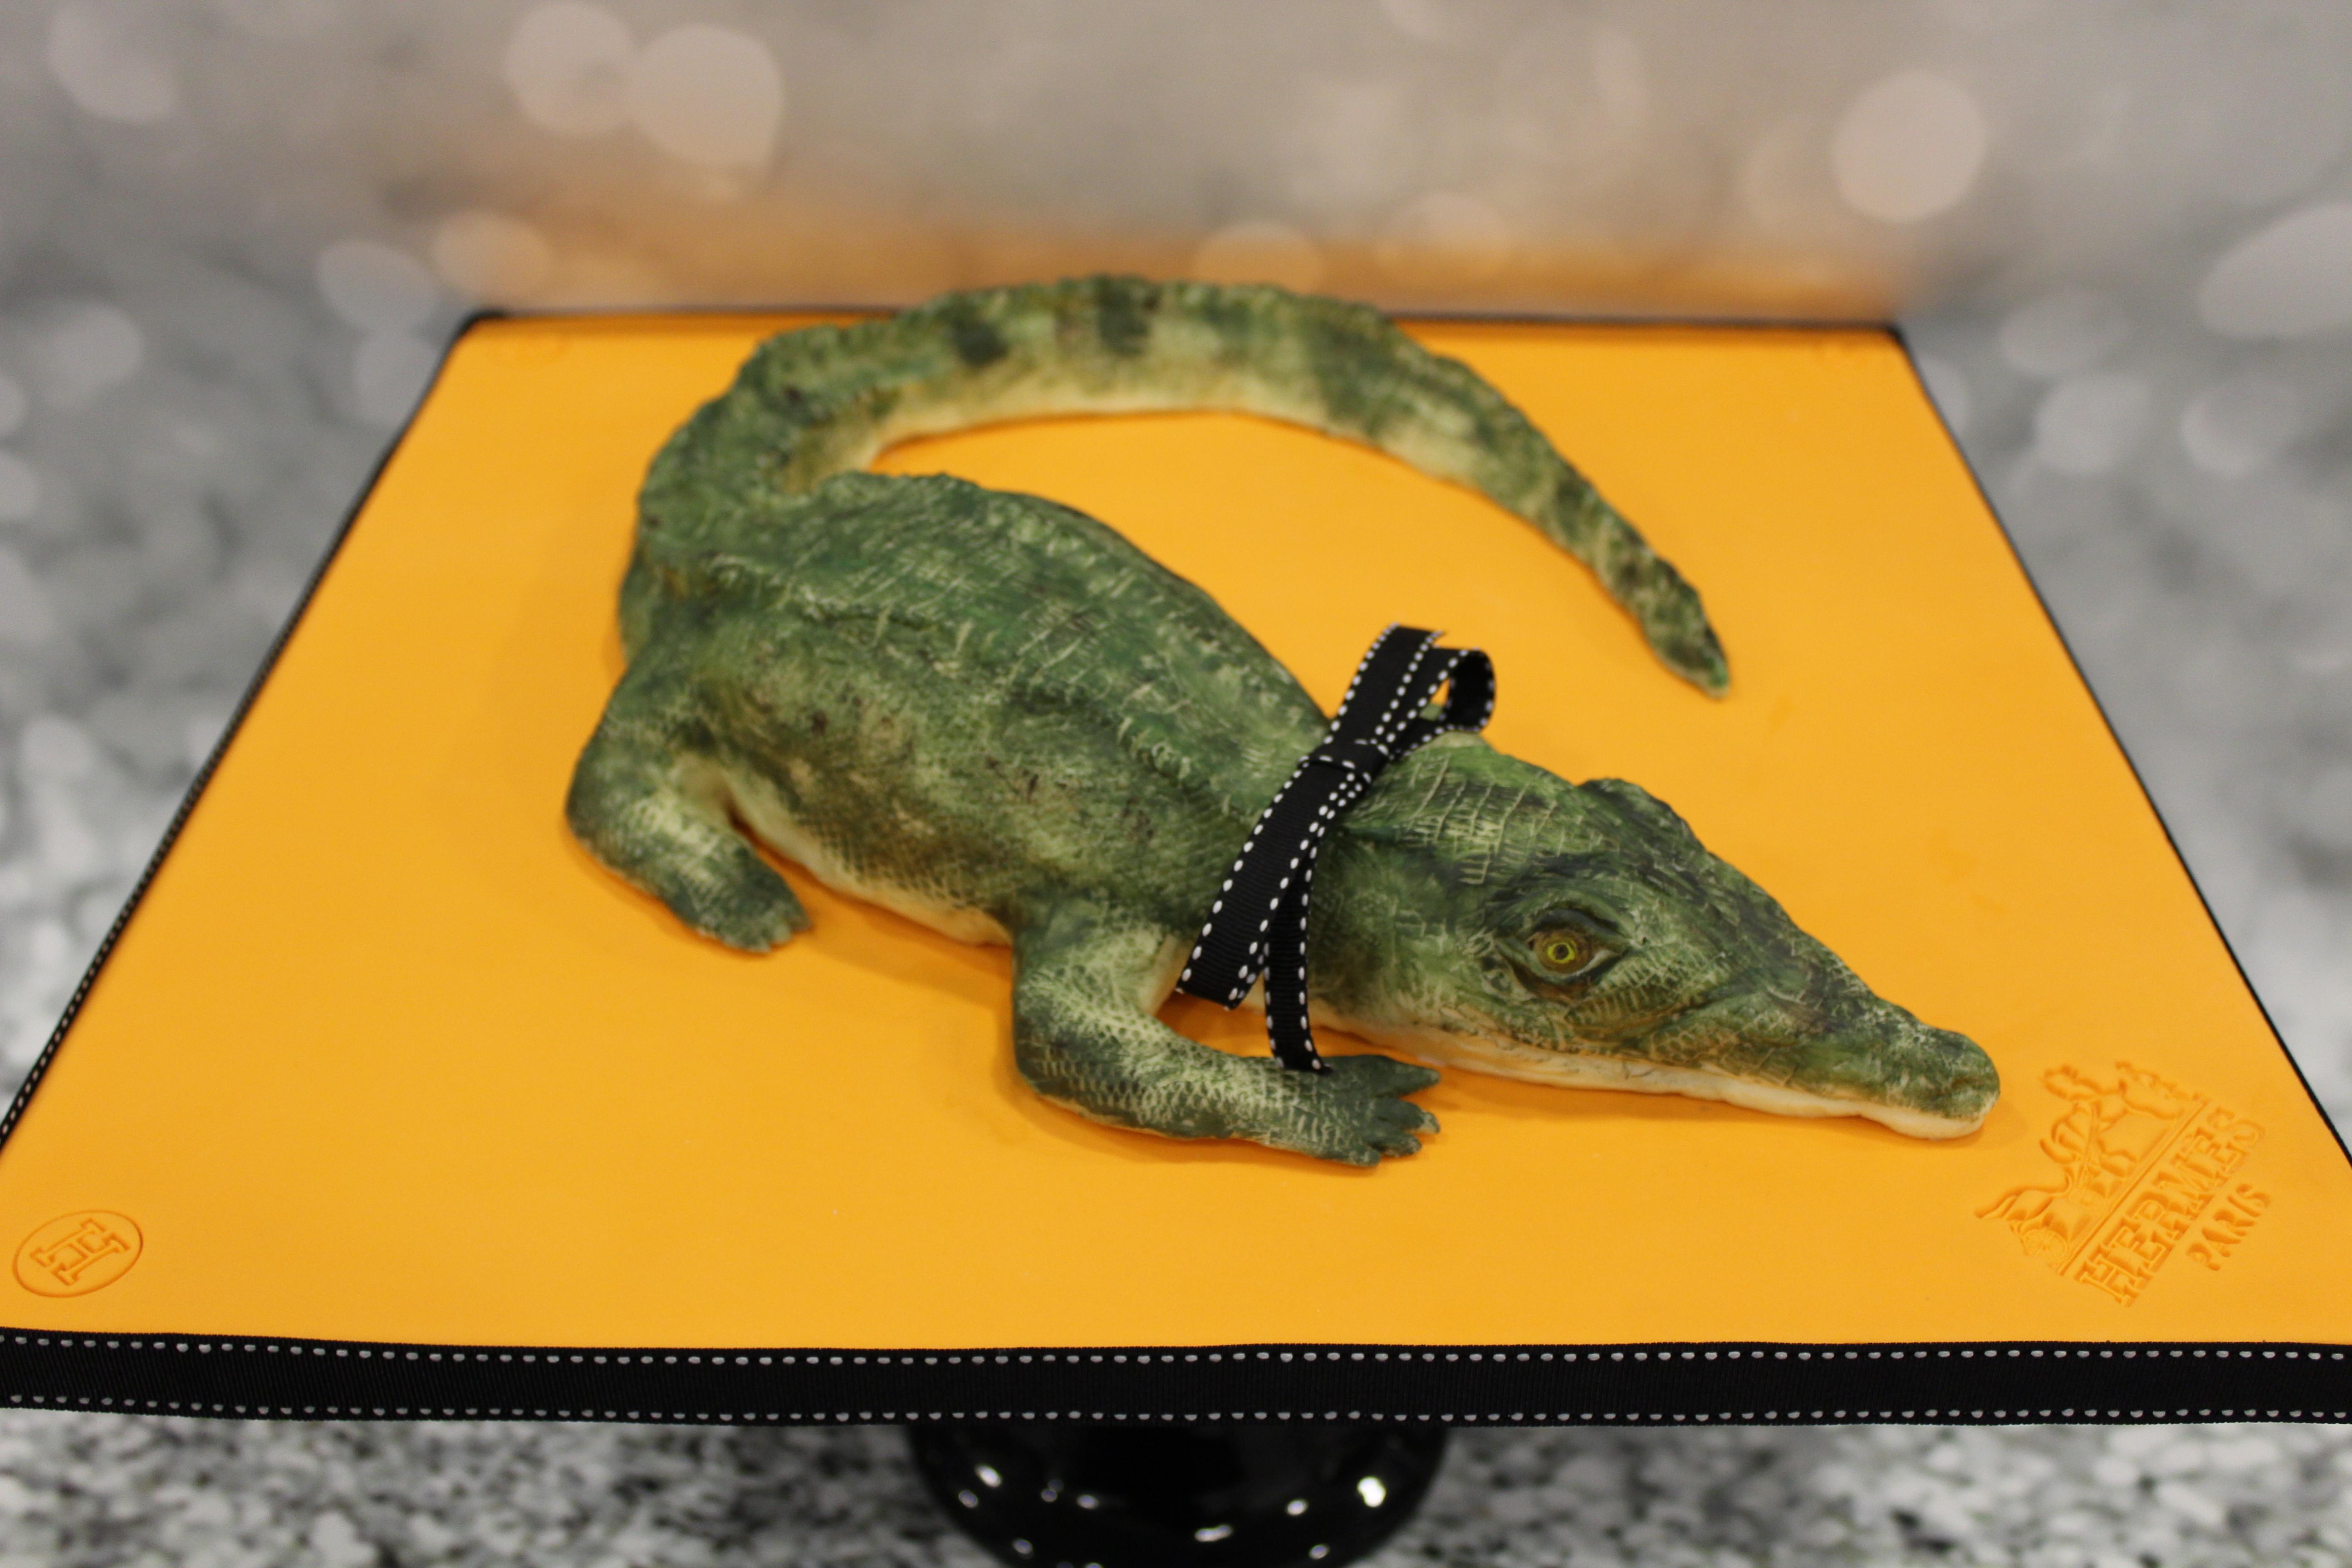 Animal-Rights-Denise-Passarelli-Denise-Makes-Cakes-Crocodile.jpg#asset:13718